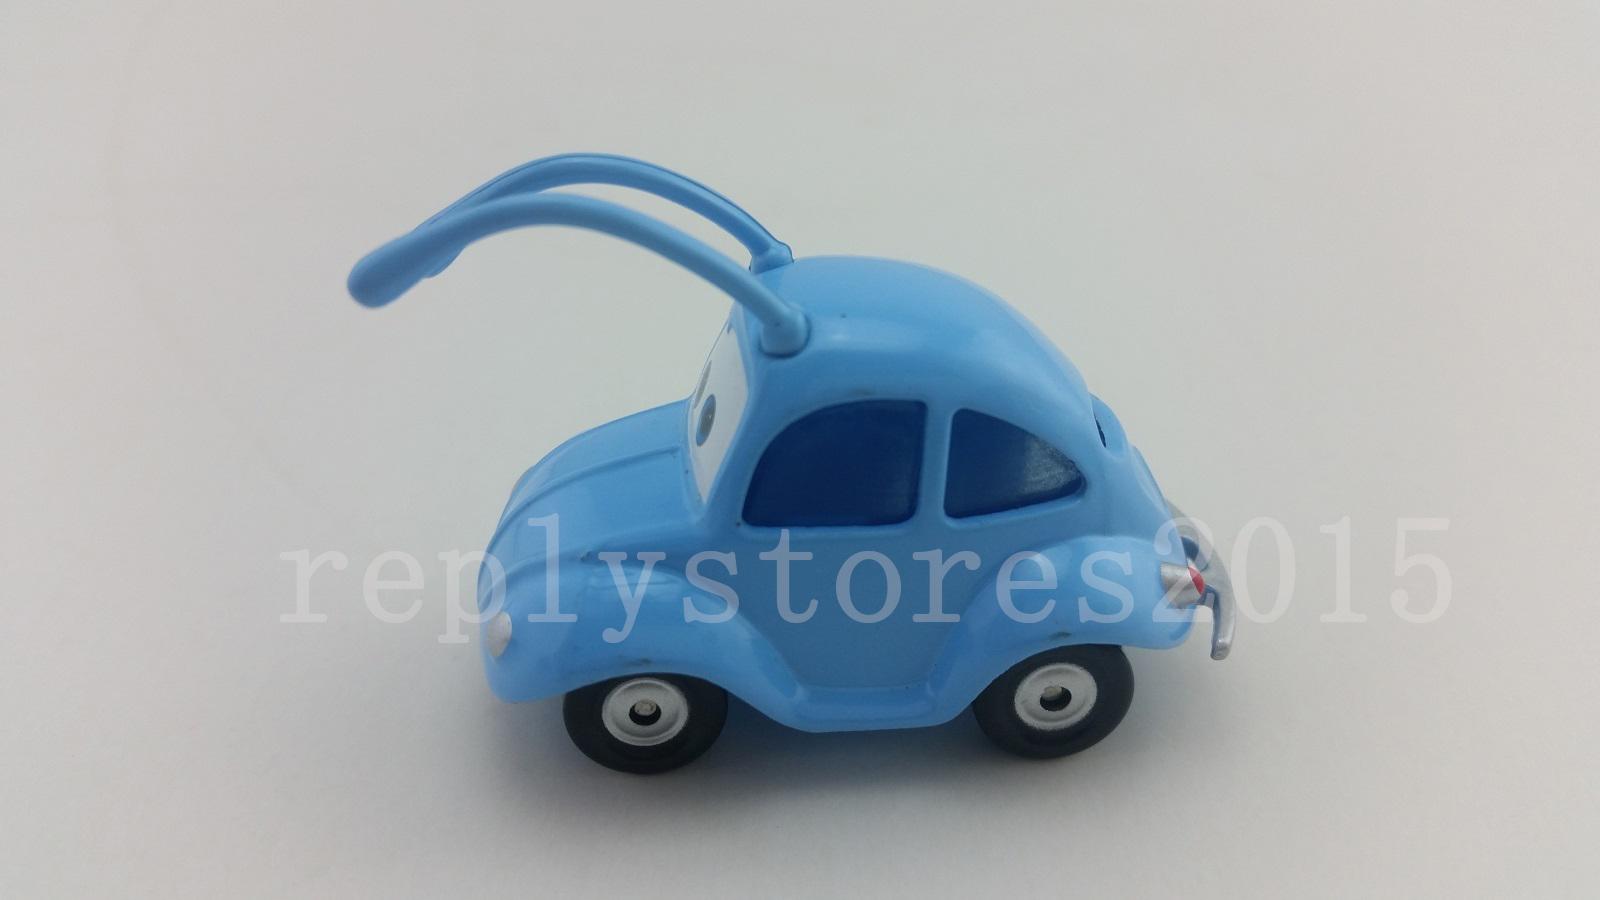 New Toy Cars : Mattel disney pixar cars p t flea metal diecast toy car